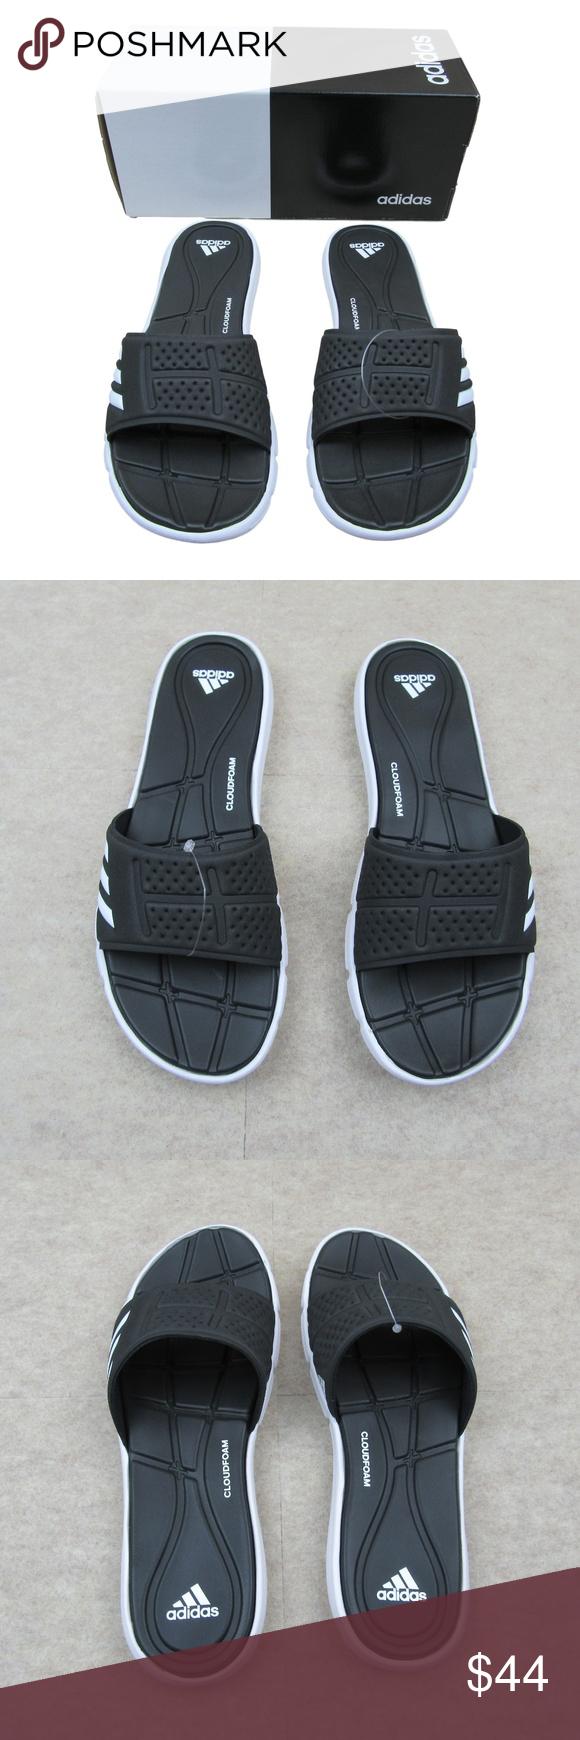 2190e590e733 Adidas Adilette Adipure CF Slippers Sandals Size 8 Adidas Adilette Adipure  CF Slippers Sandals Soft Black Flats BB4558 Size 8 Women s Black   White  Logo ...